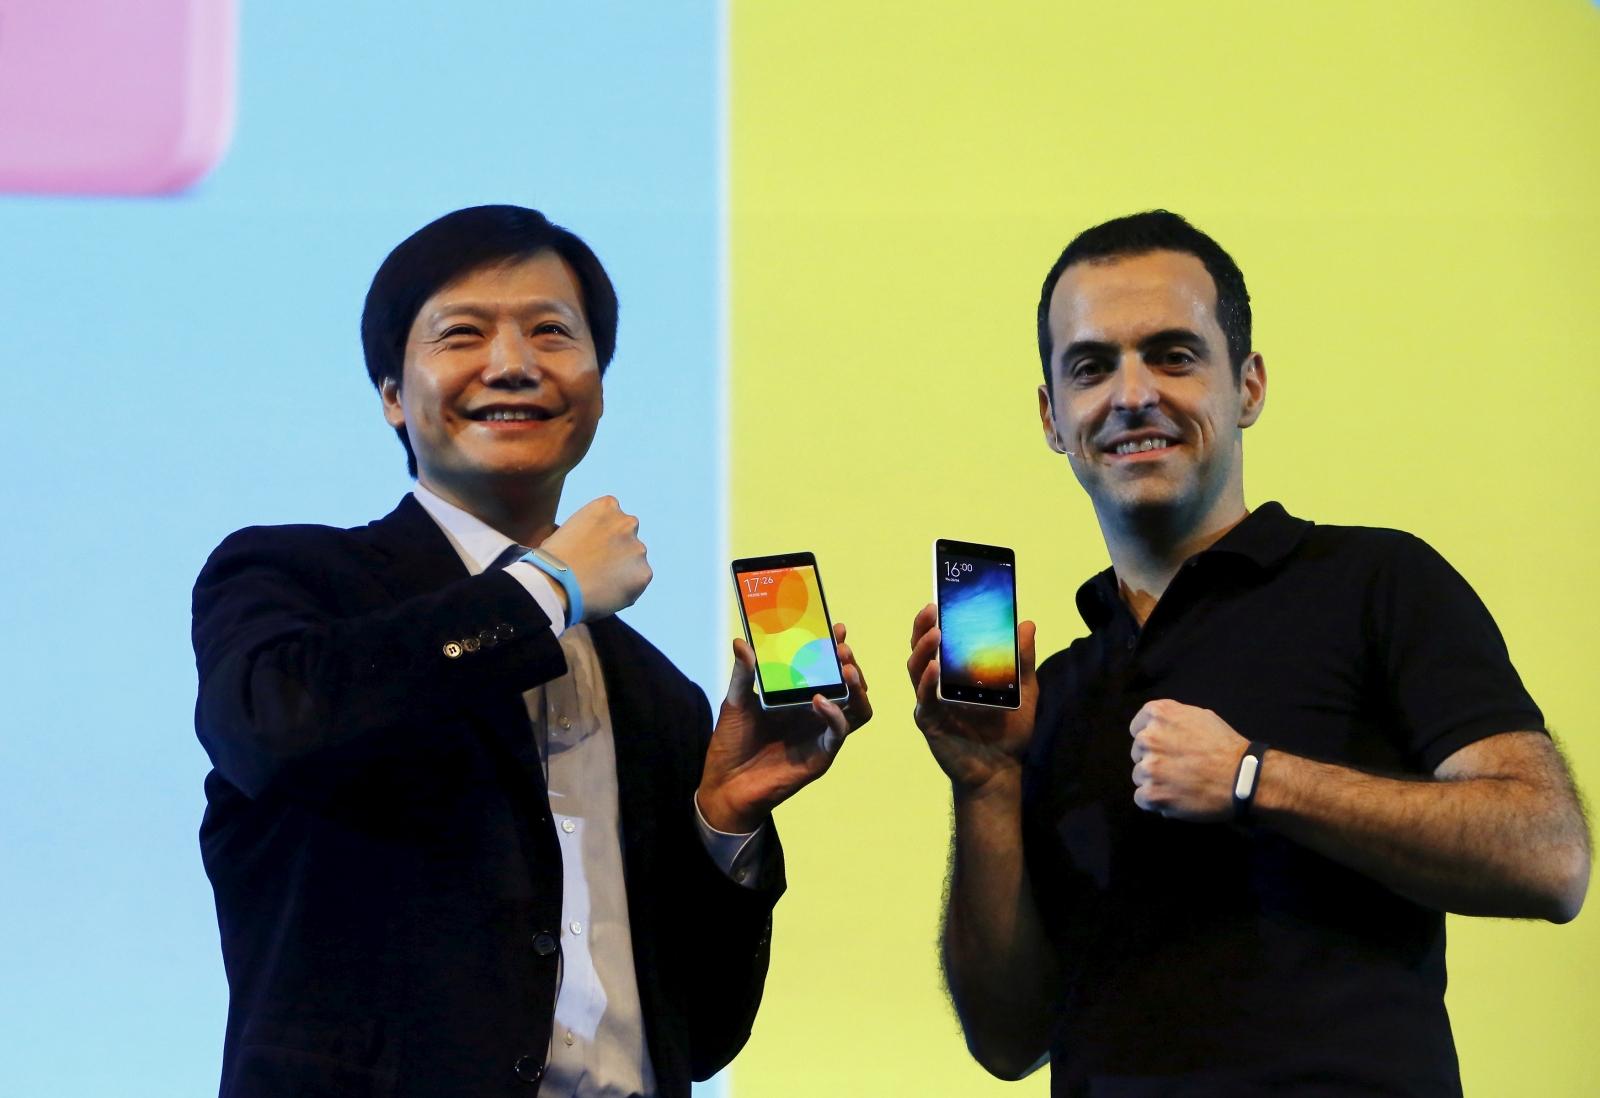 Xiaomi's Lei Jun and Hugo Barra